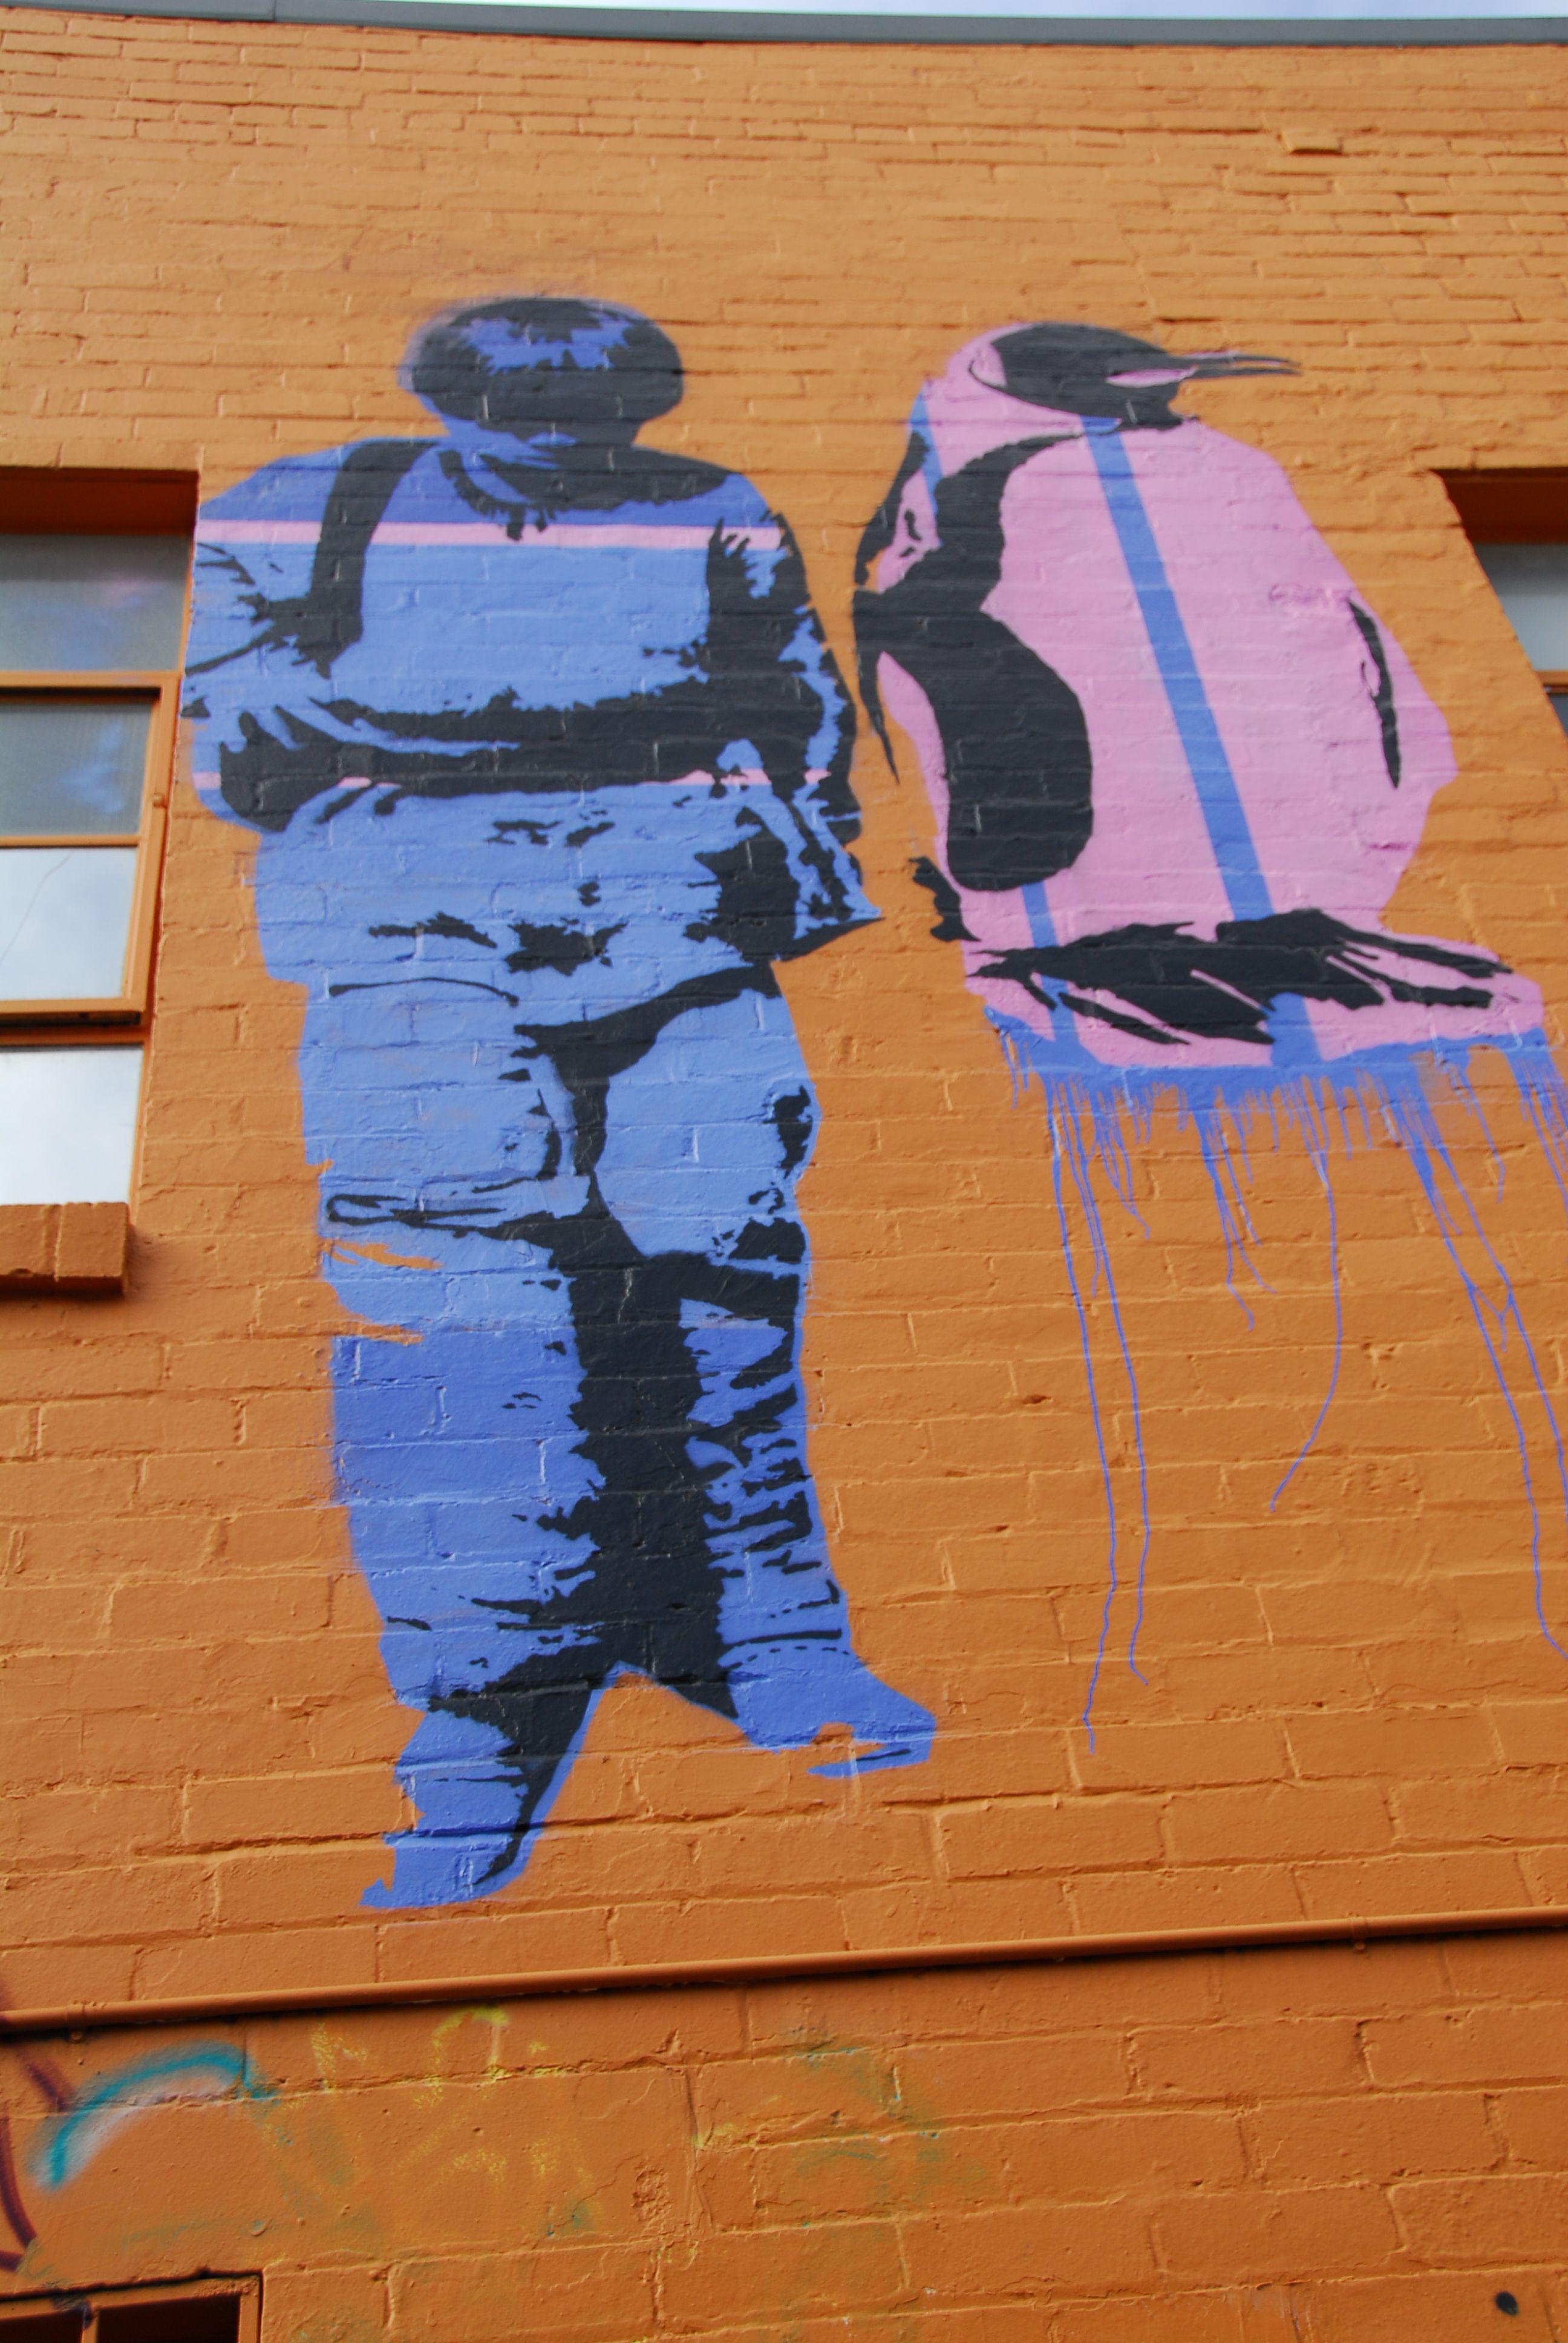 Collingwood #collingwood #melbourne #2006 #streetartgraffiti #streetart #streetartaustralia #streetartmelbourne #melbournegraffiti #graffiti